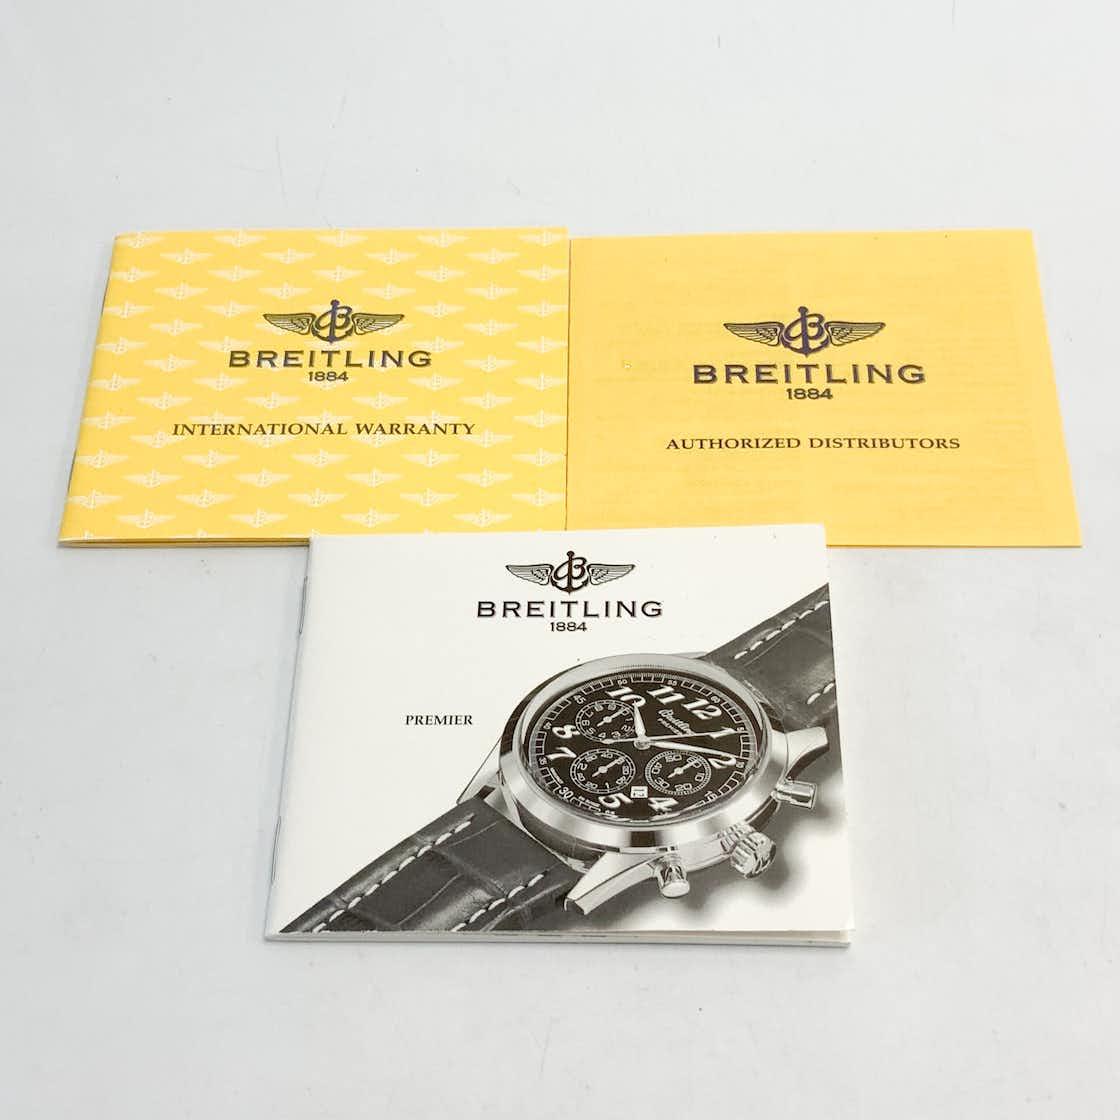 Breitling Navitimer Premier A42035/G197